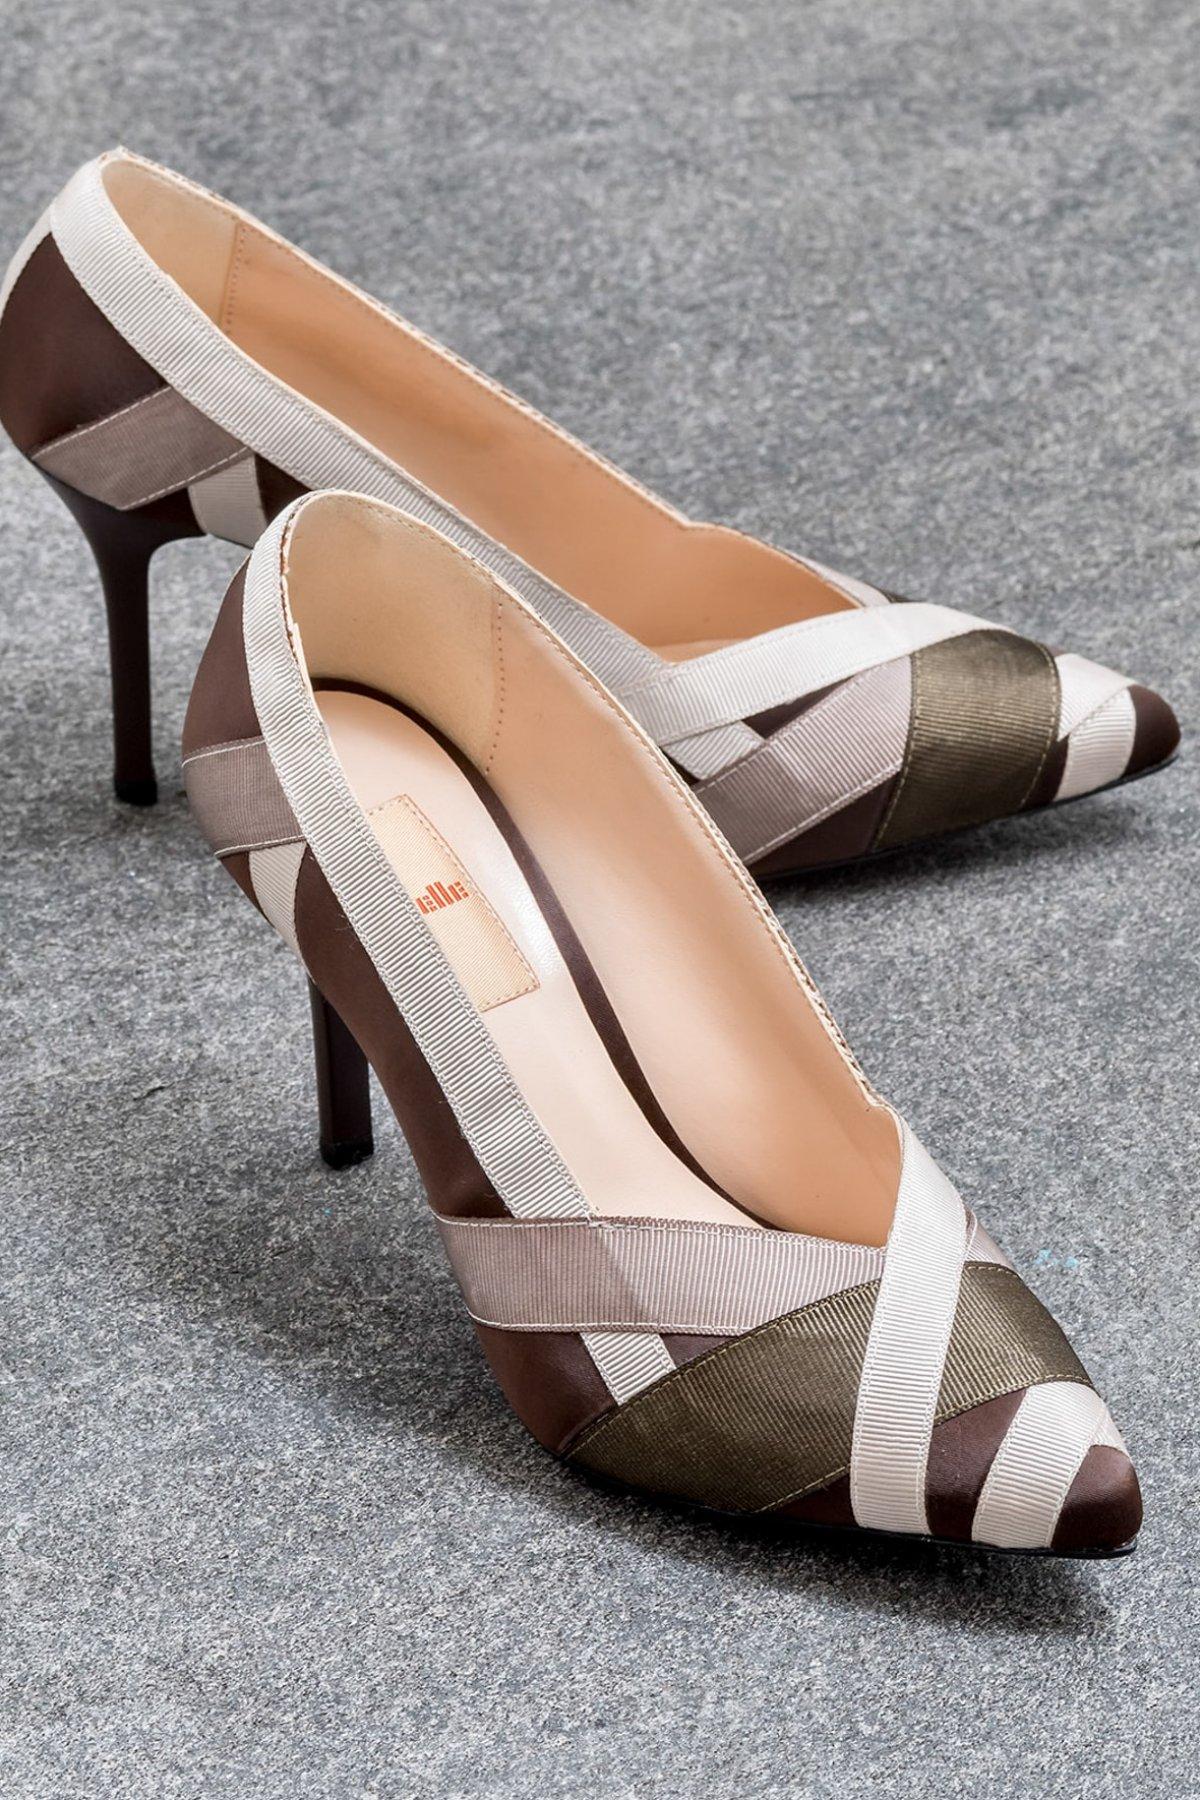 Elle Shoes Elishaa Kahverengi Topuklu Ayakkabı